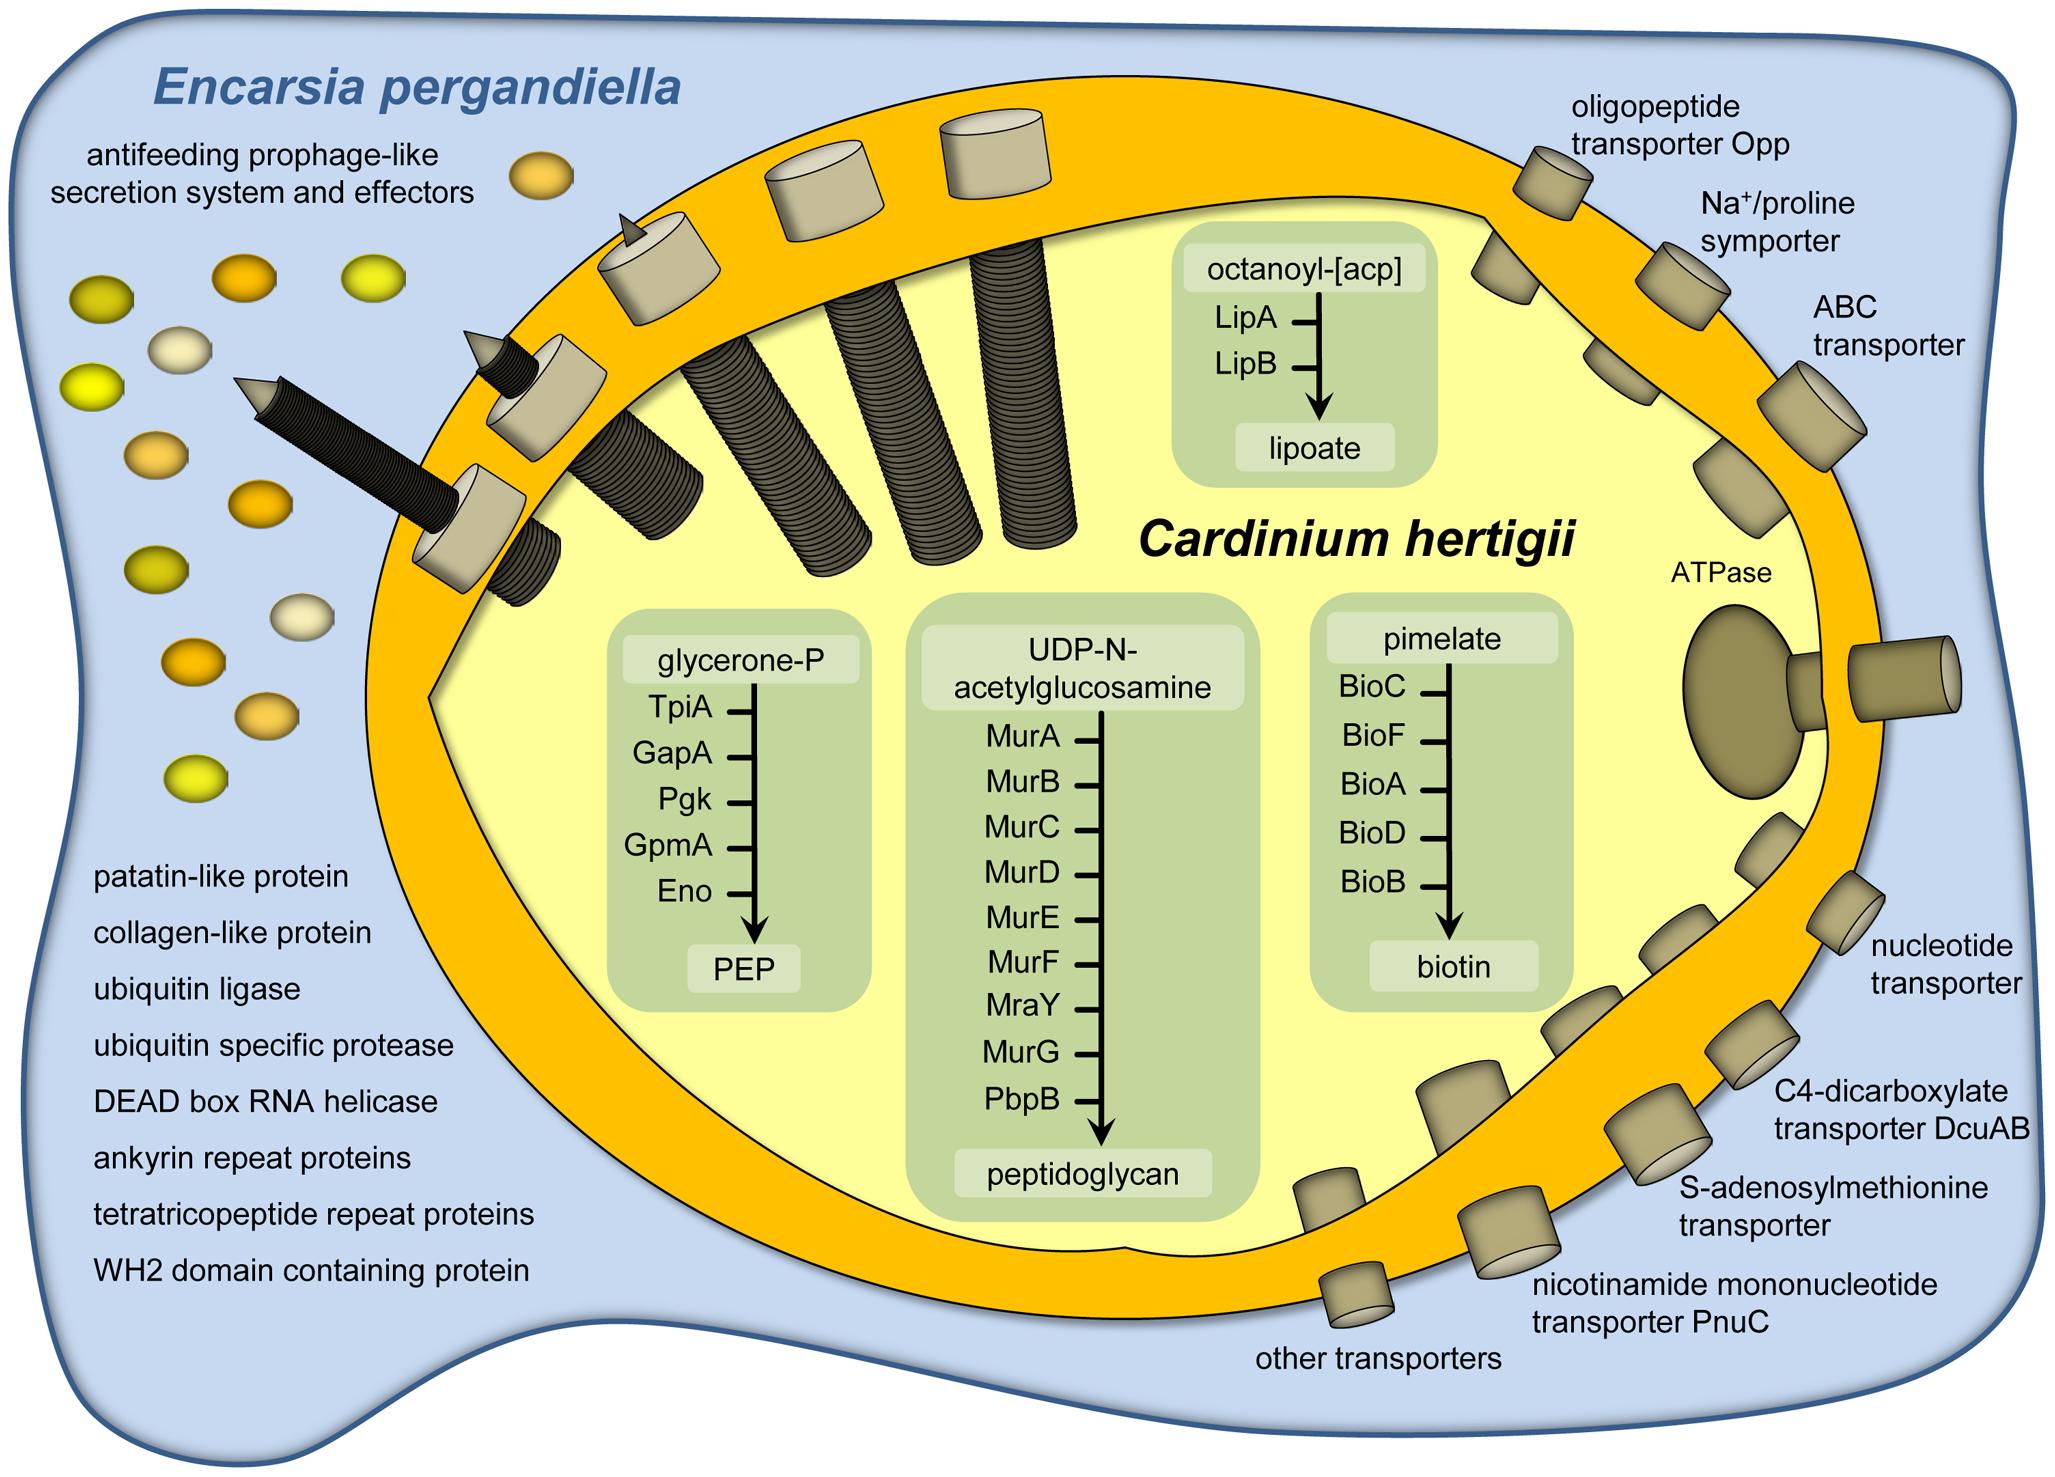 Metabolism, transport capabilities, and host cell interaction of <i>Cardinium hertigii c</i>Eper1.